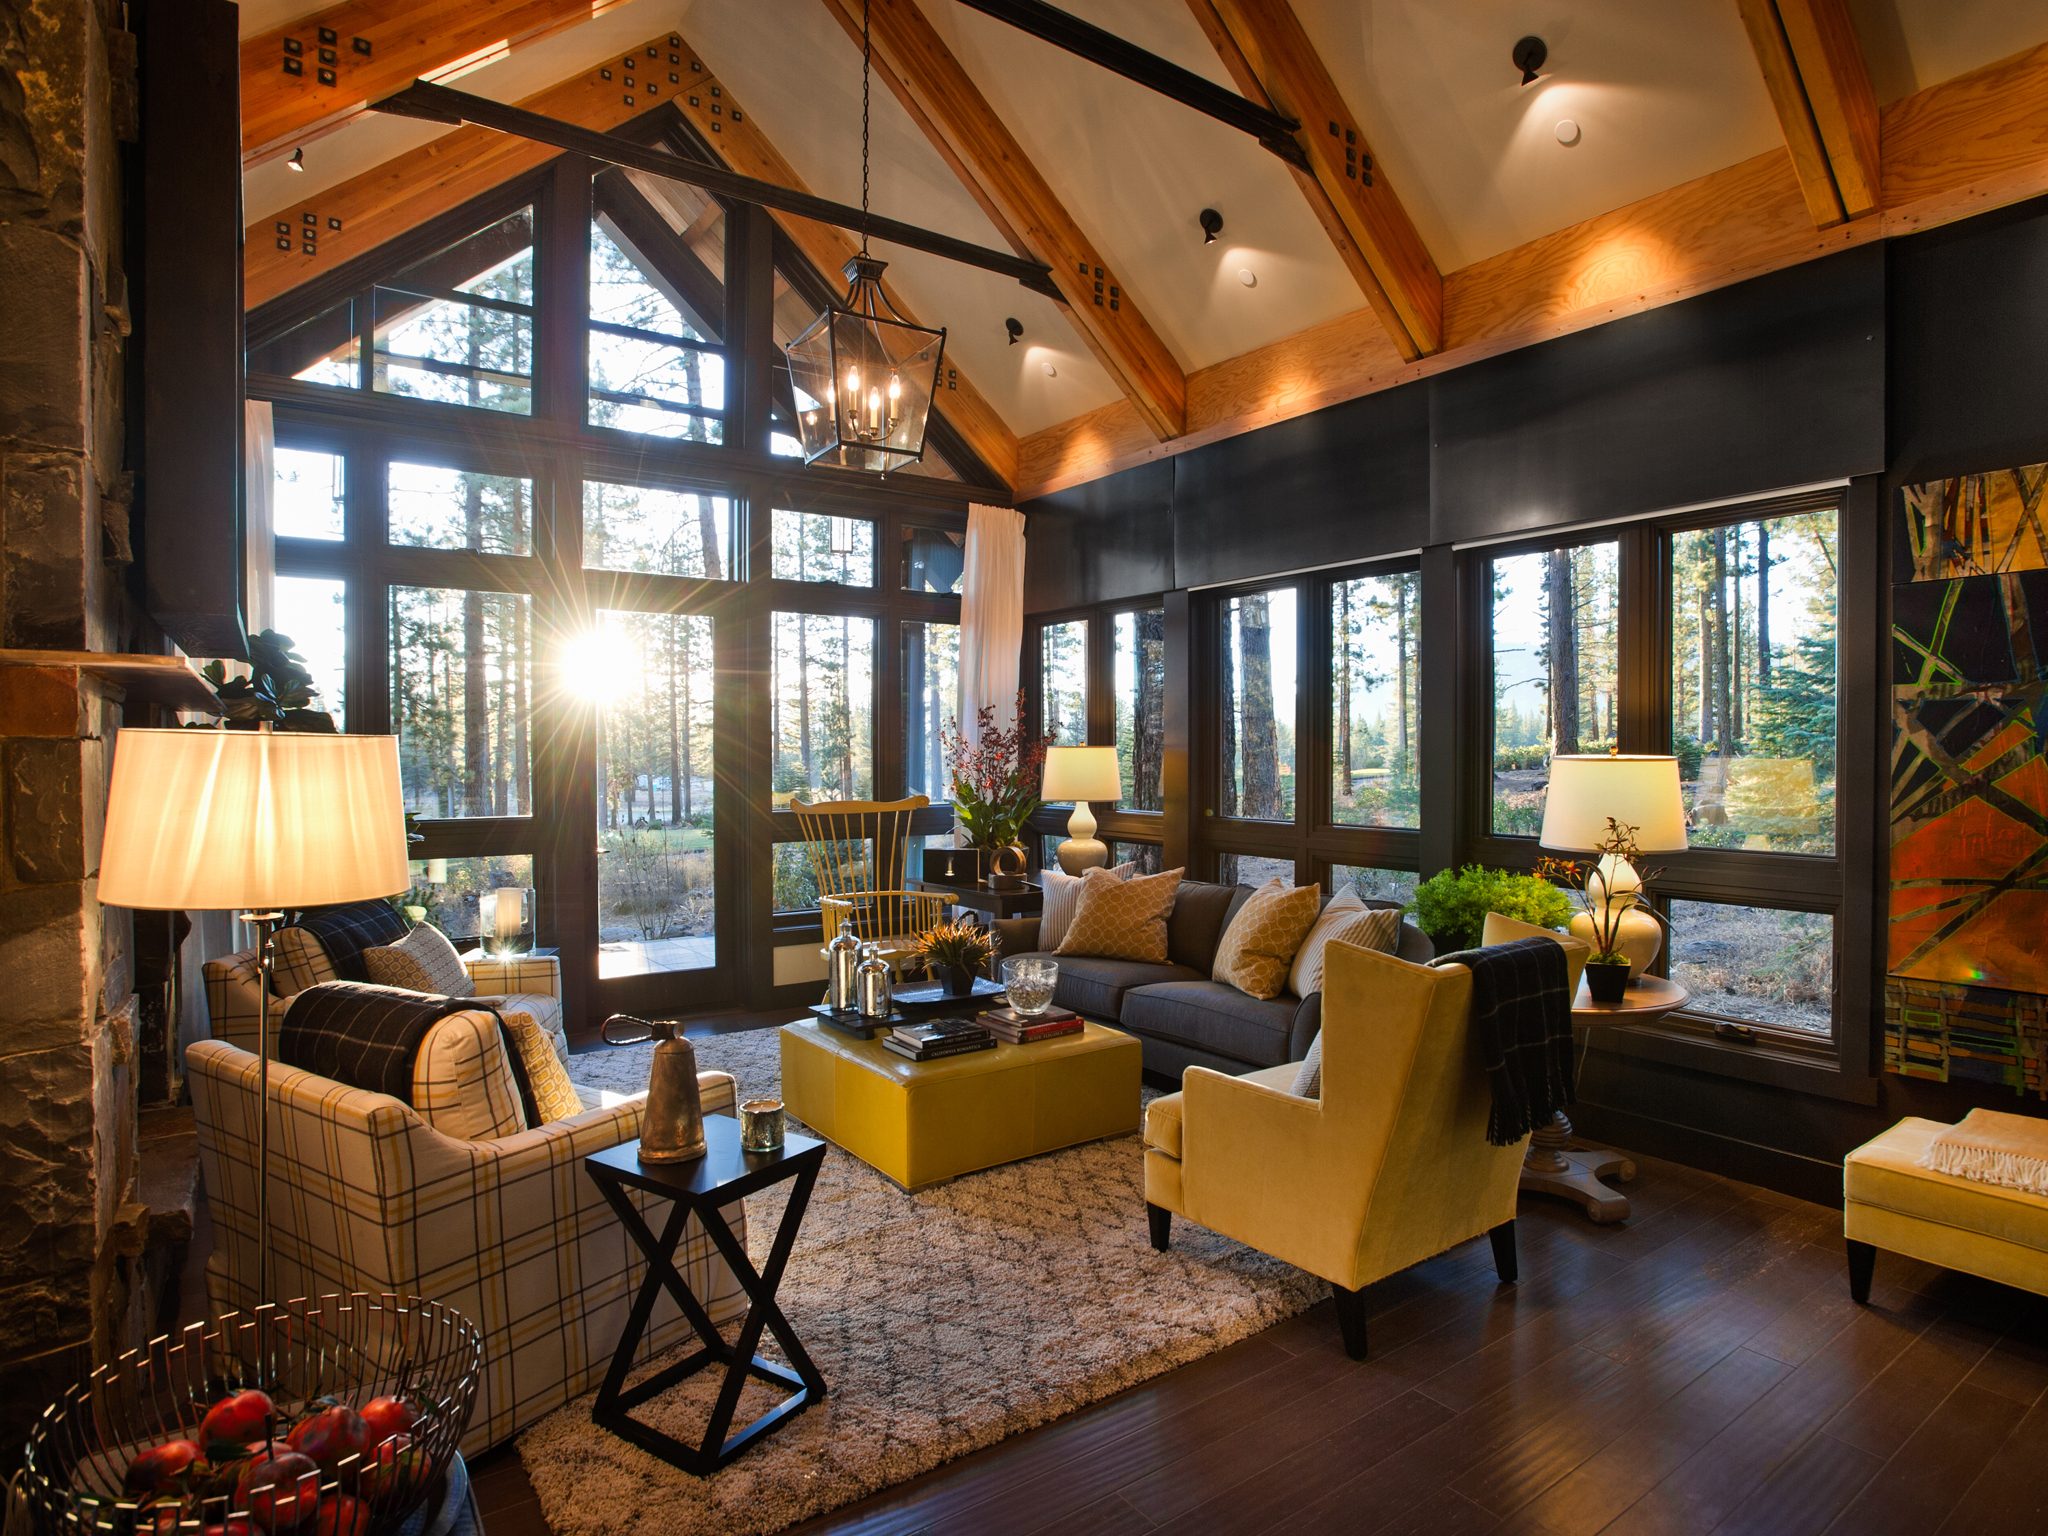 Rustic Living Room Ideas - HomesFeed